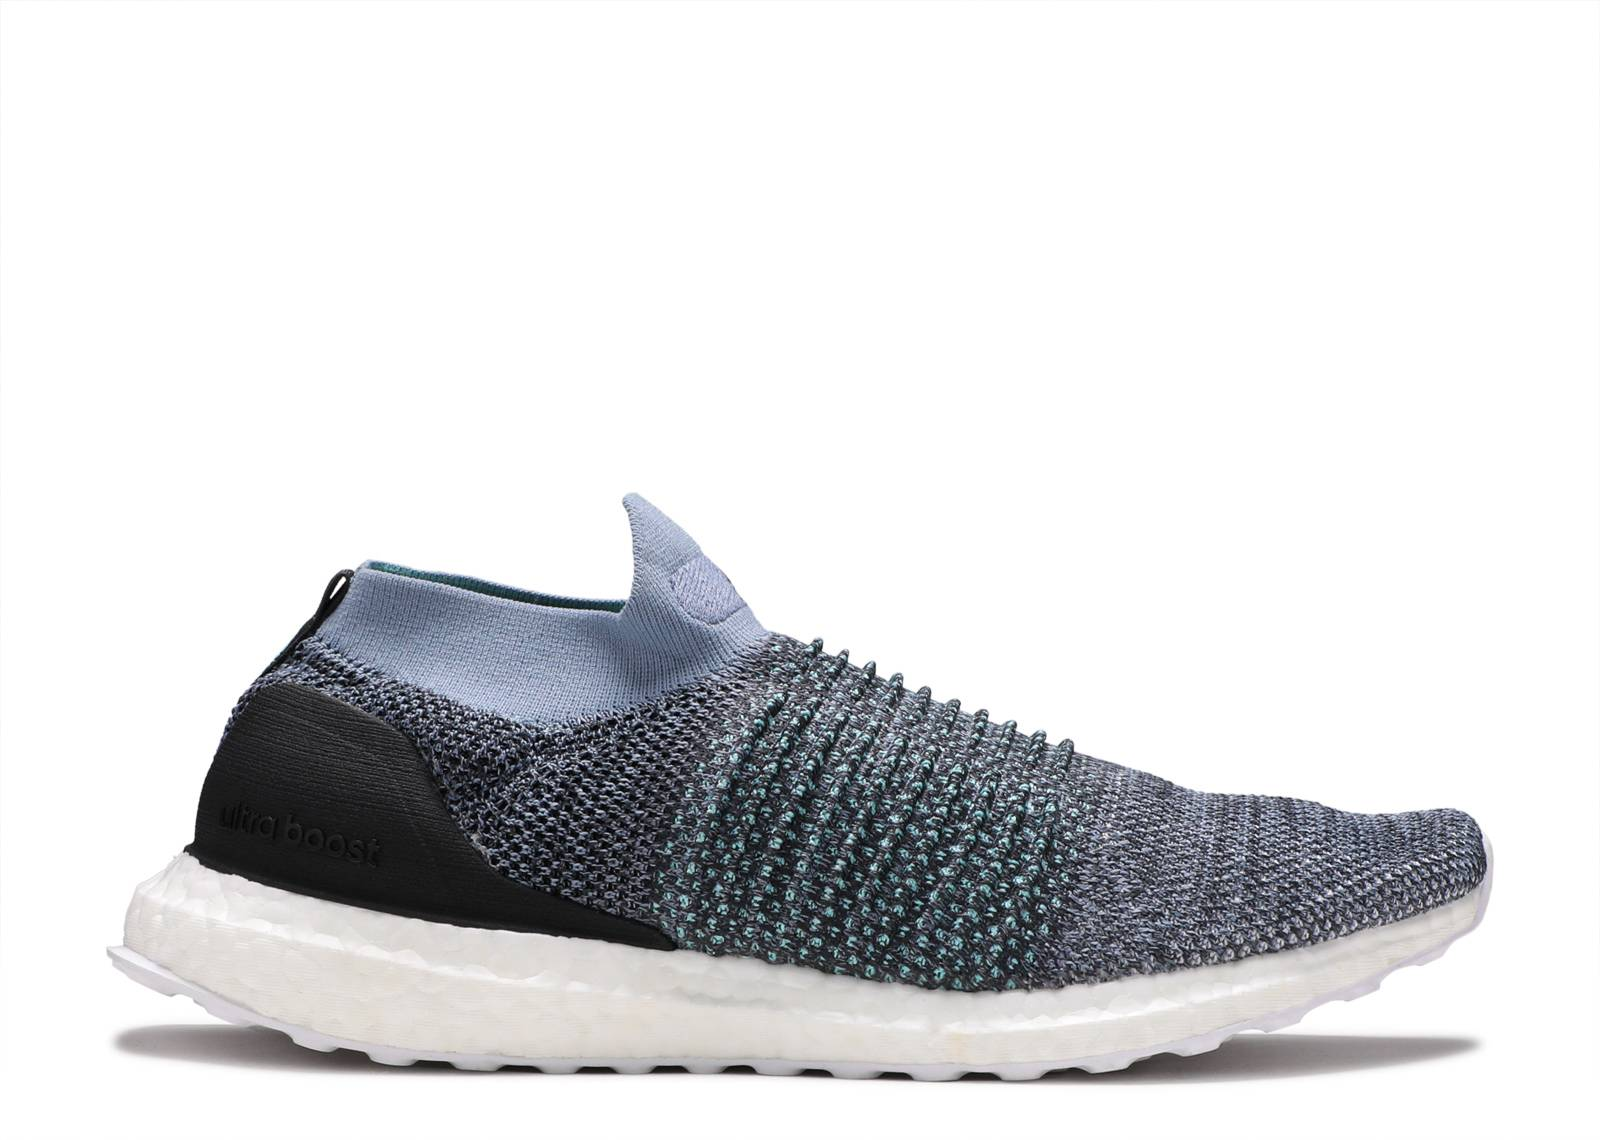 adidas Ultra Boost 4.0 Parley Carbon Blue Spirit